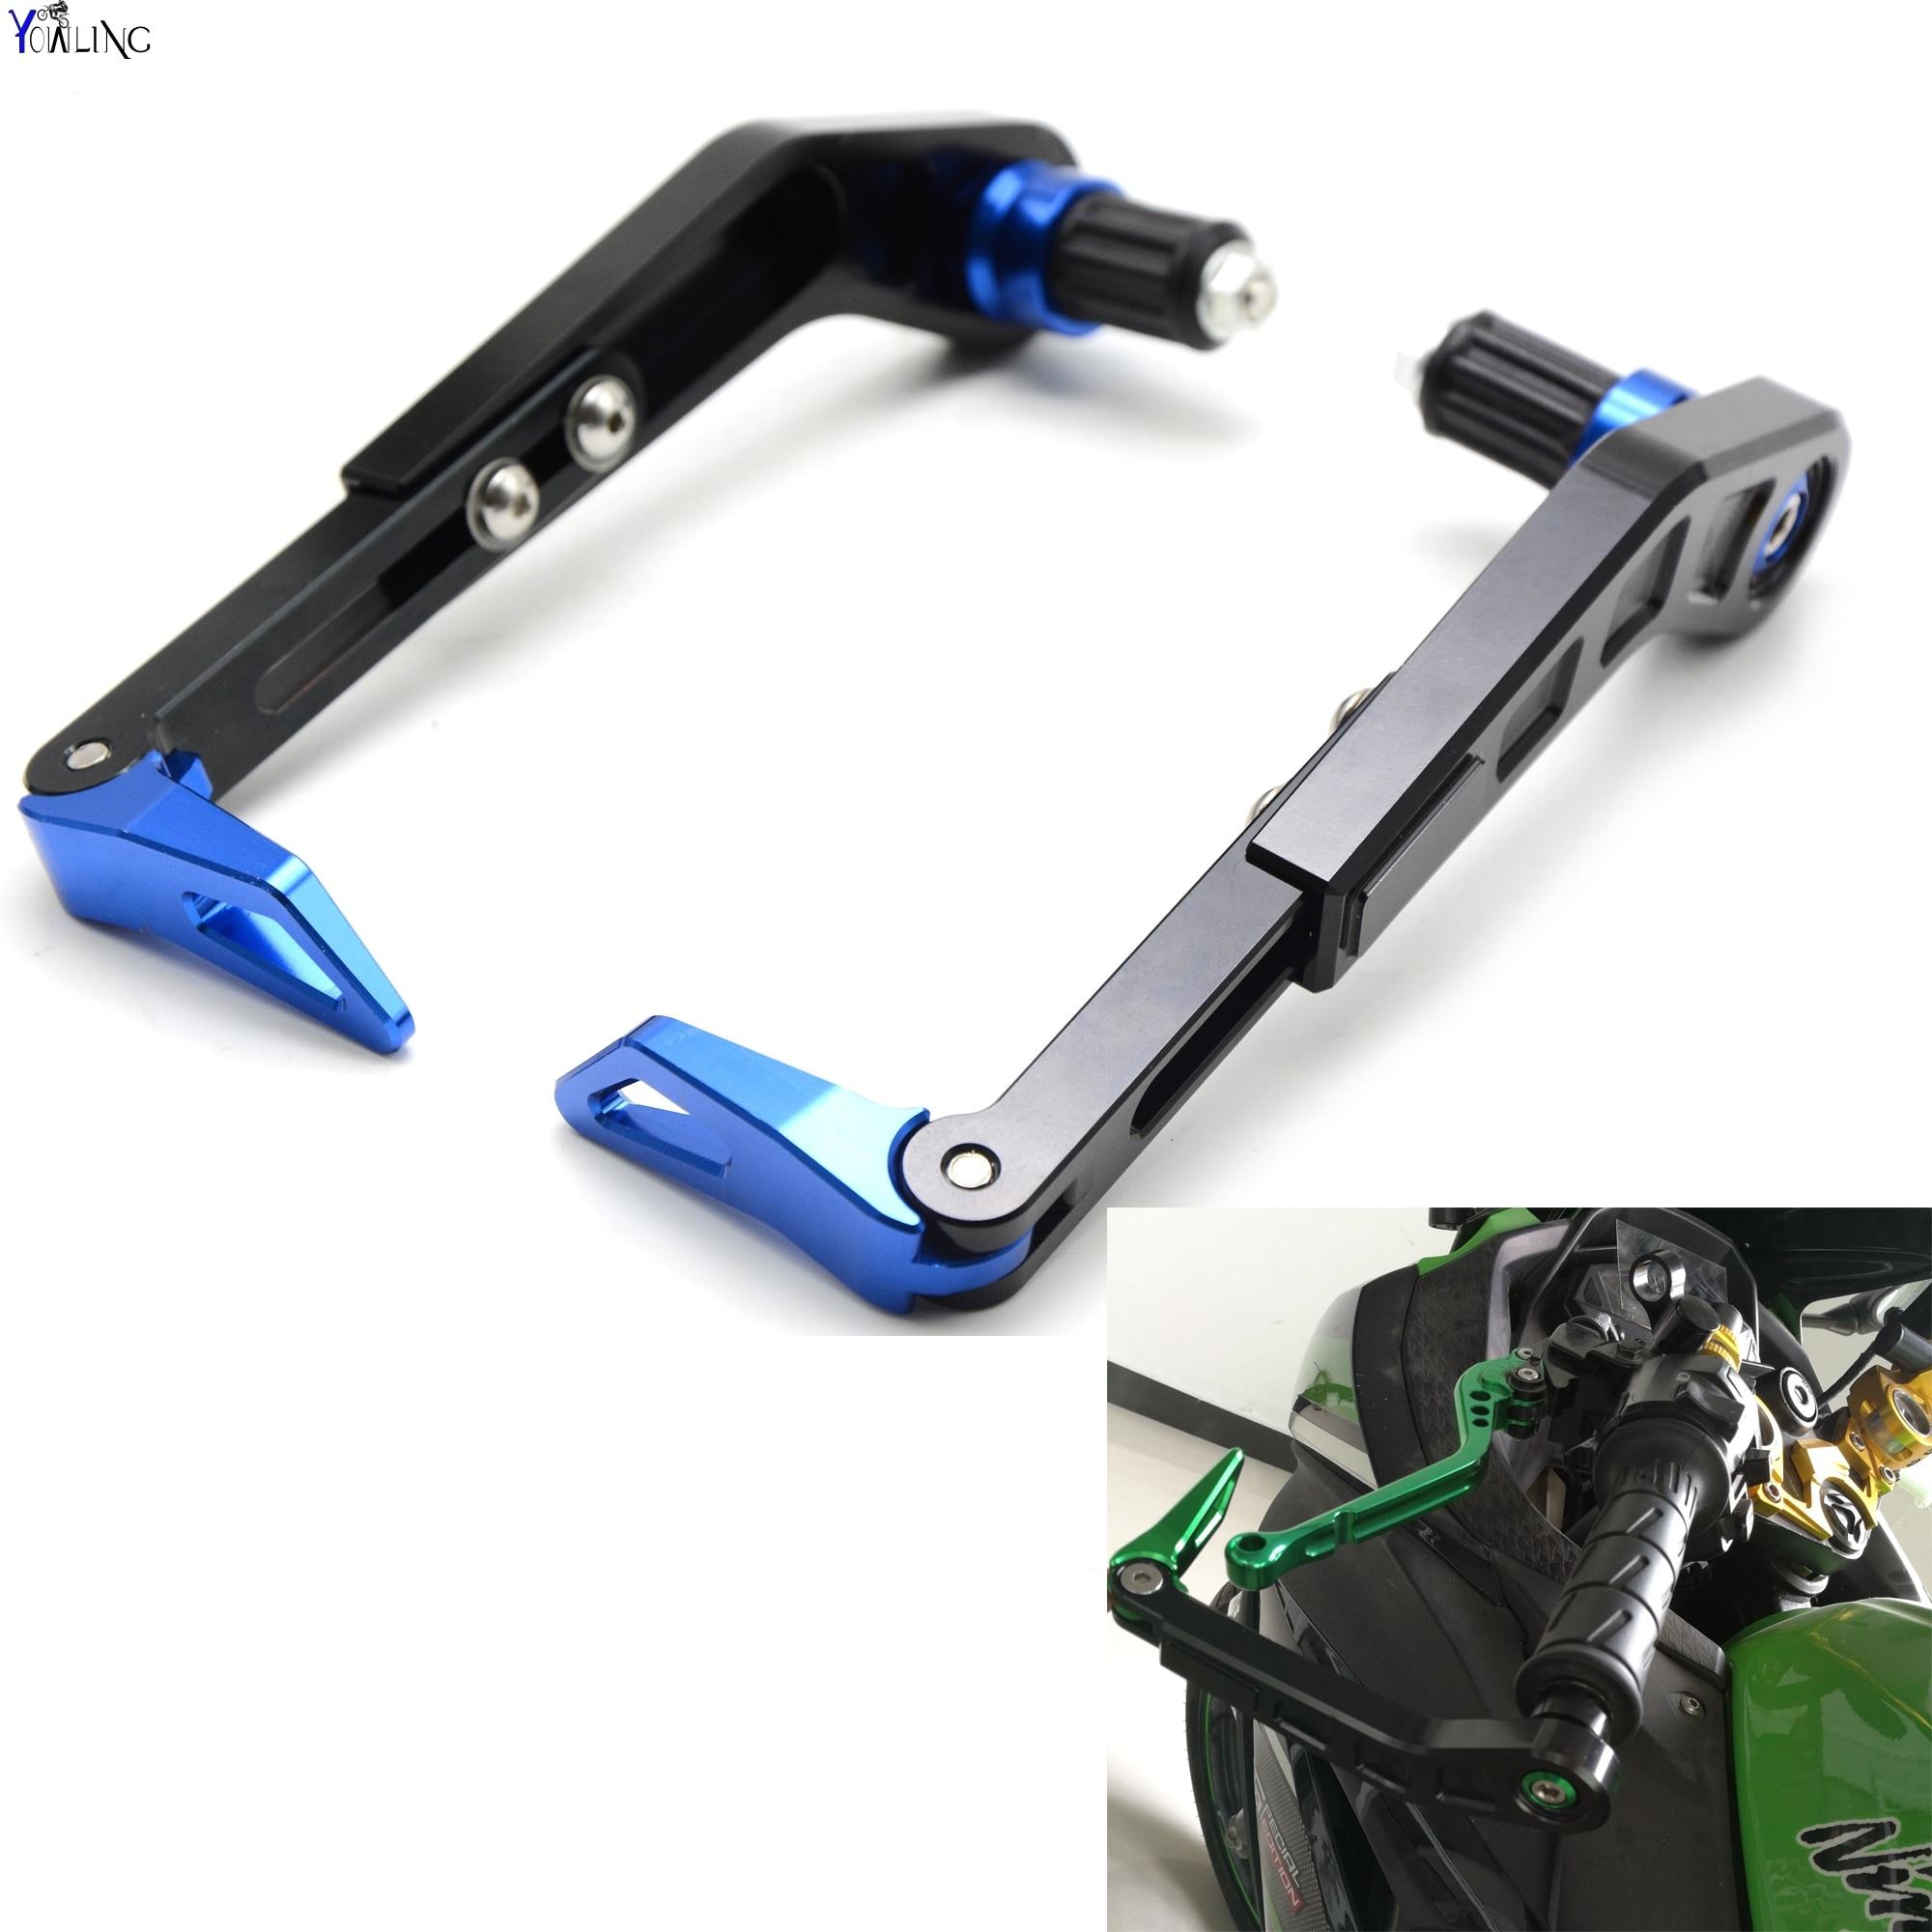 Universal 7/822mm Motorcycle Handlebar Brake Clutch Lever Protect Guard for SUZUKI GSX750 GSX1000 GSX1250 GSX1400 GSX650F GSXR